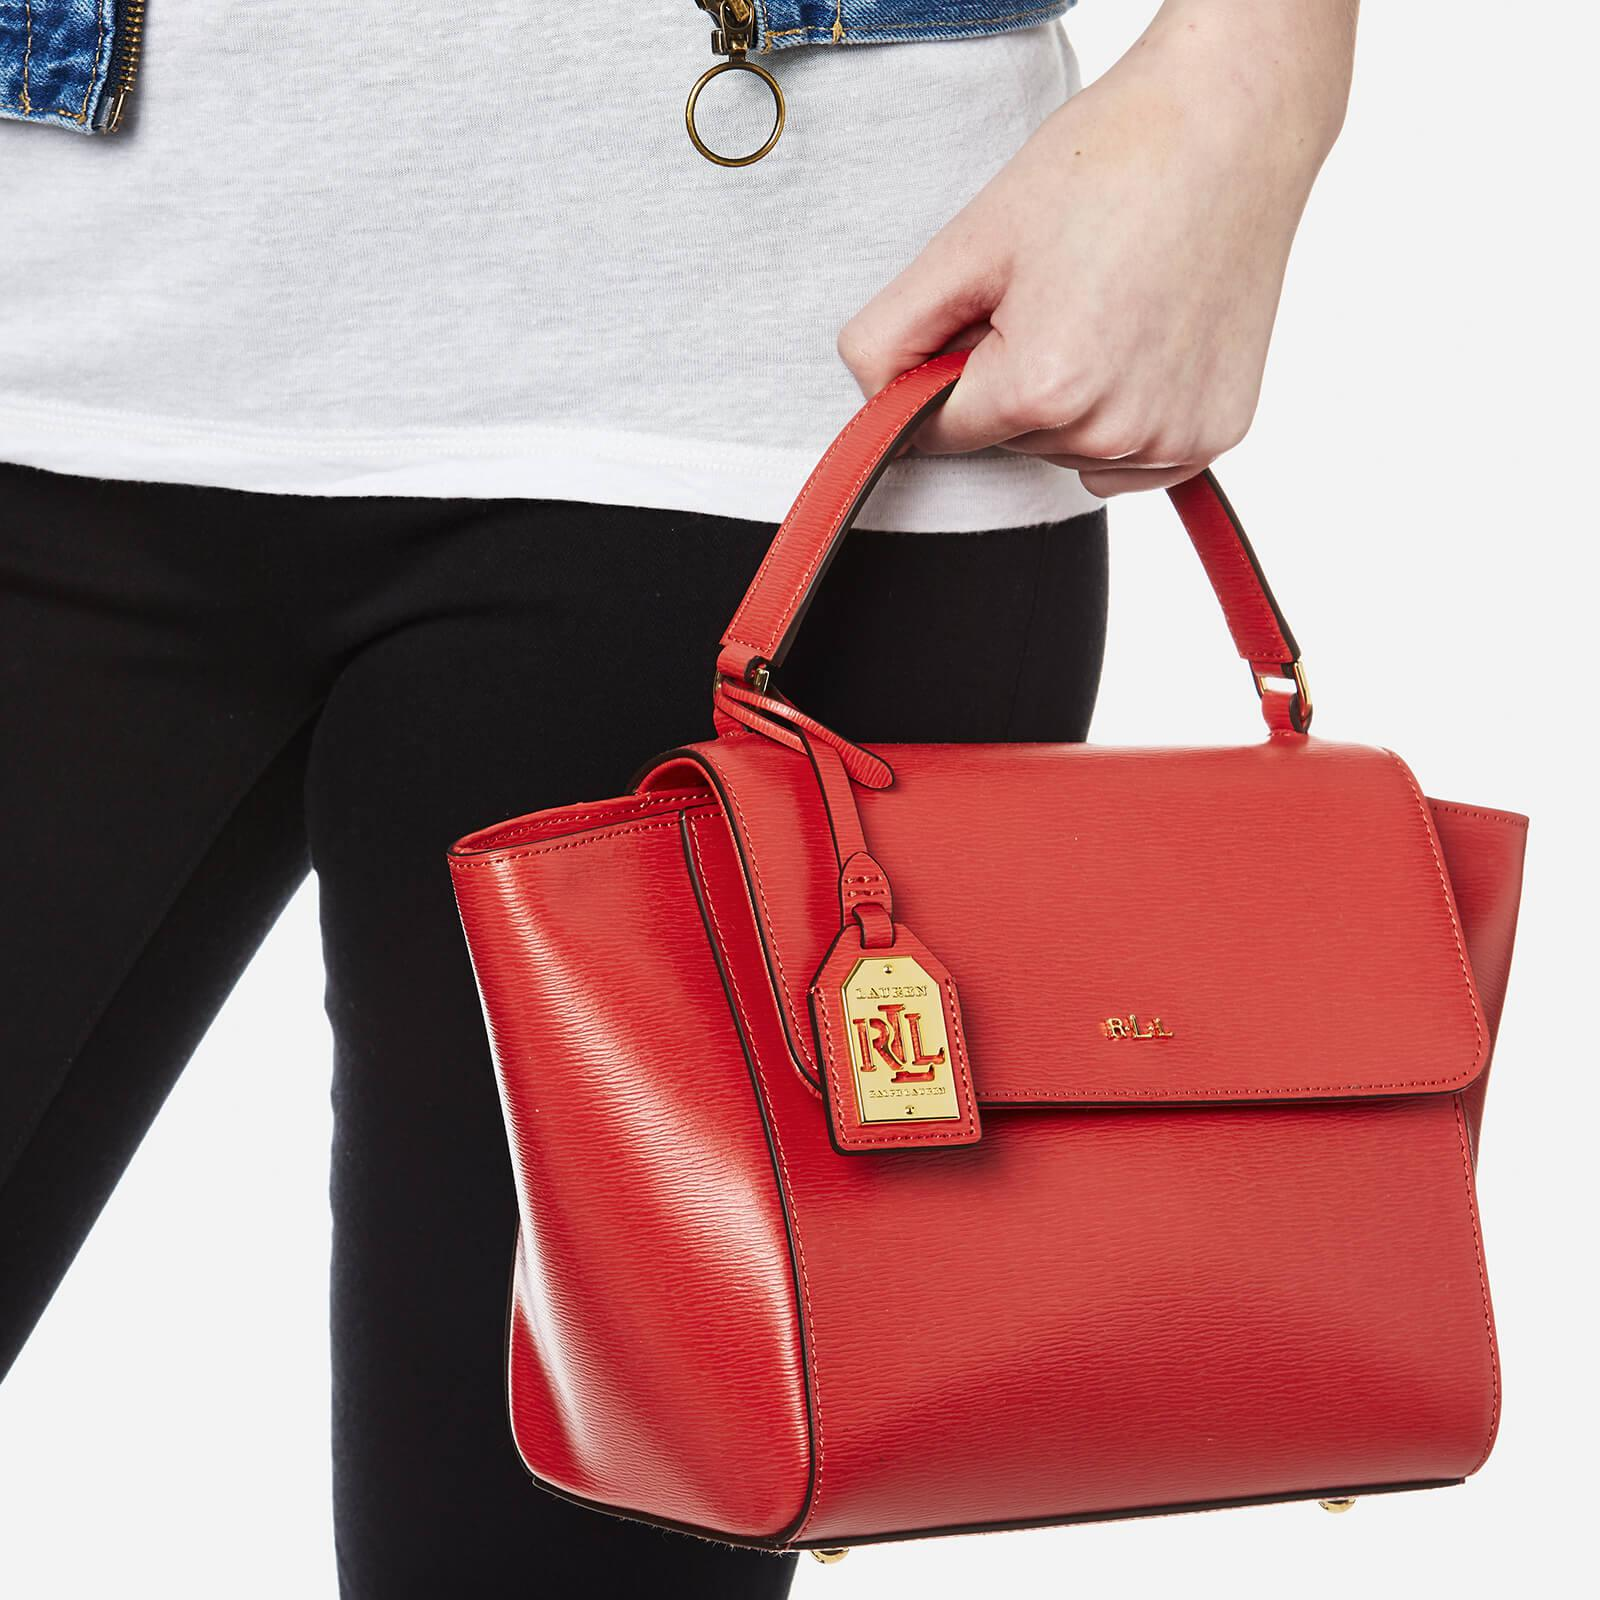 f9da34de1c28 Lyst - Ralph Lauren Barclay Cross Body Bag in Red